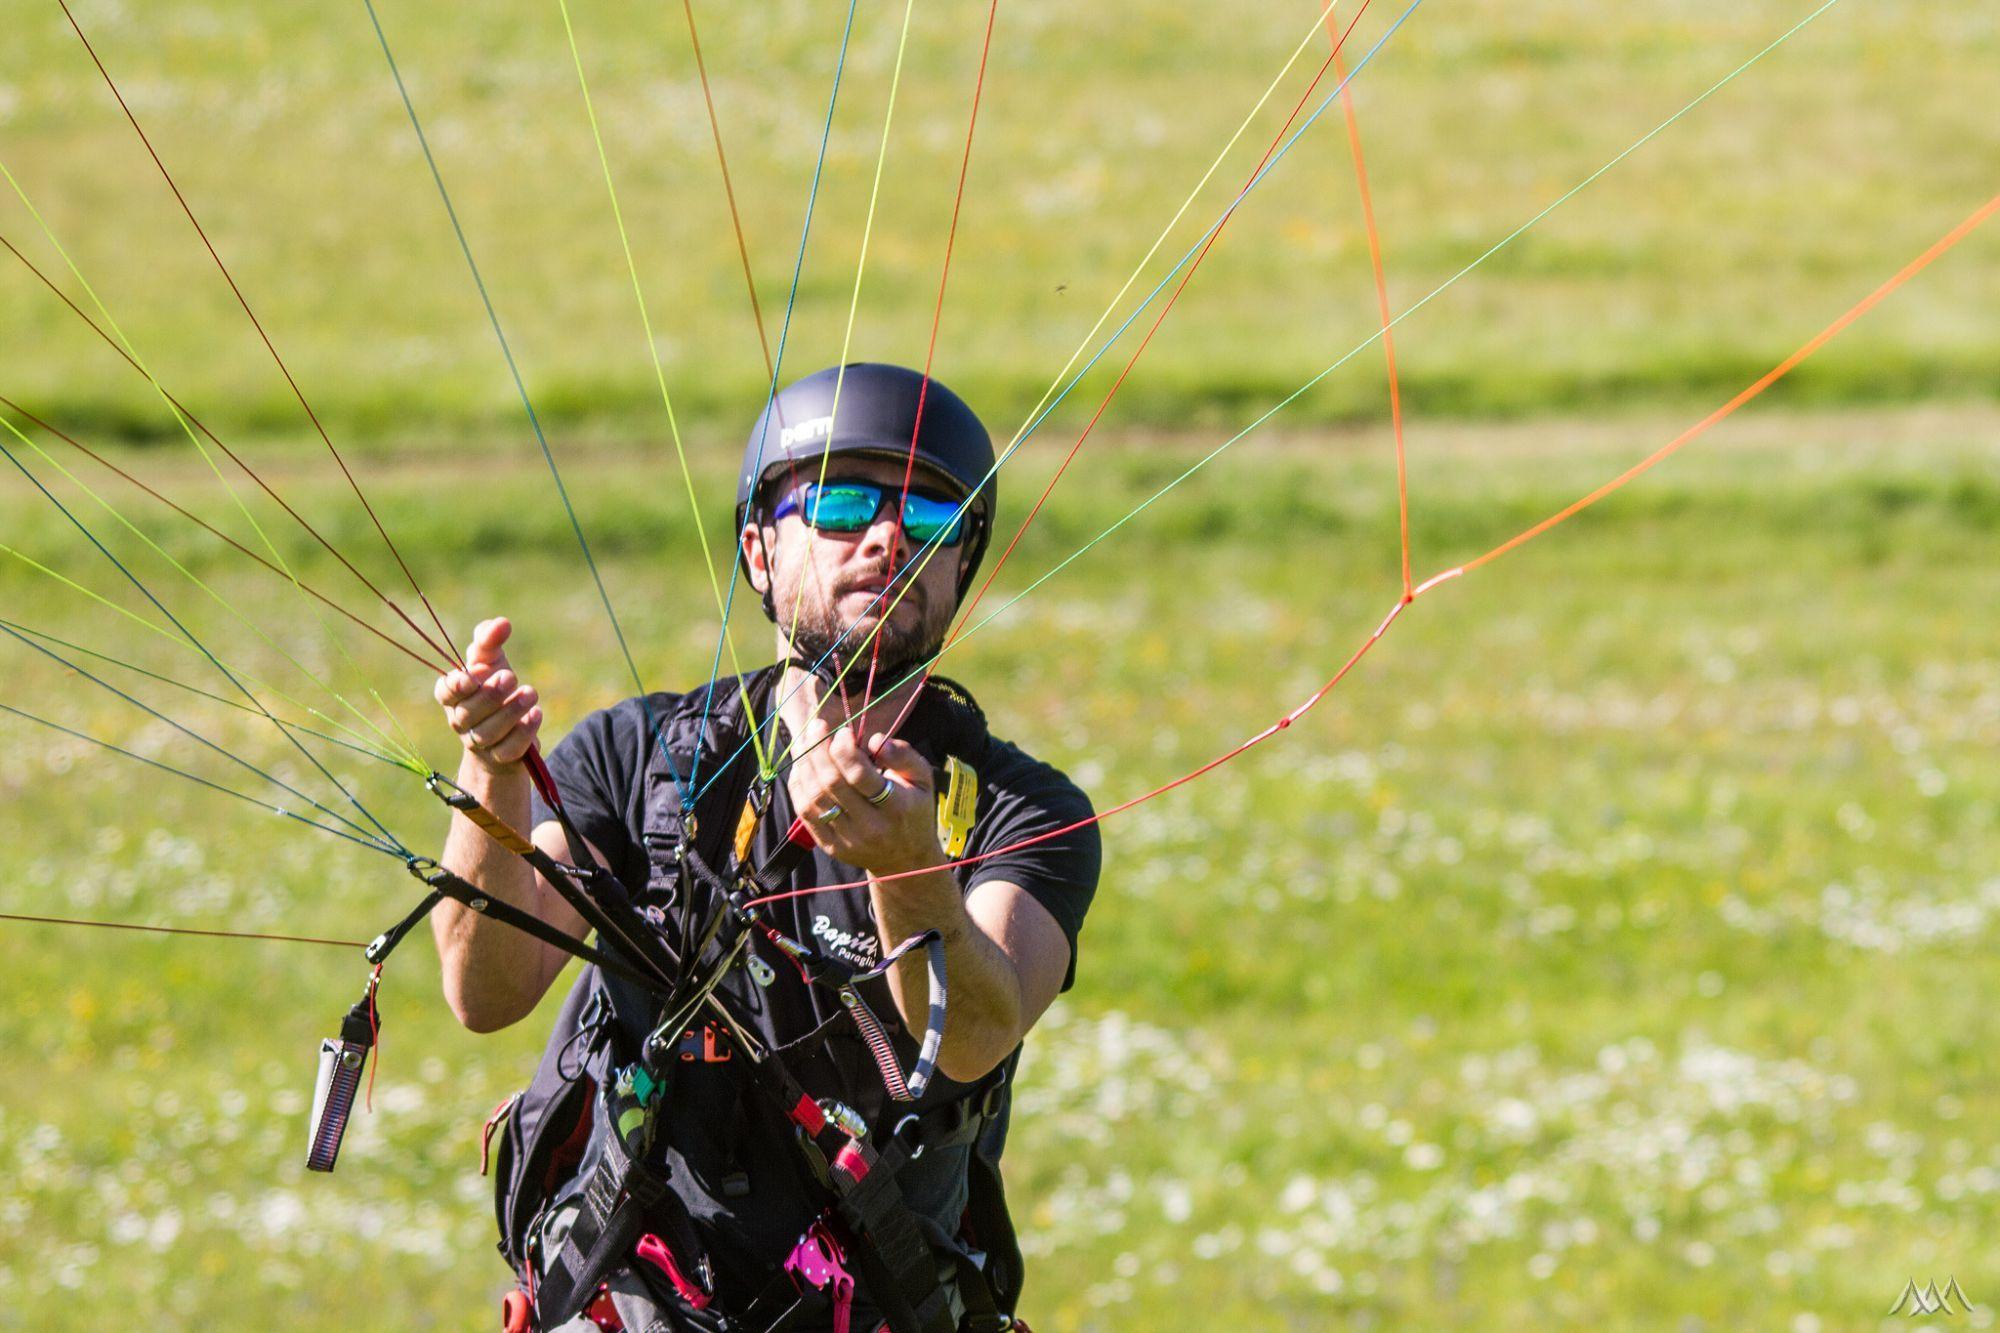 Paragliding-Bilder - Papillon Paragliding Wasserkuppe